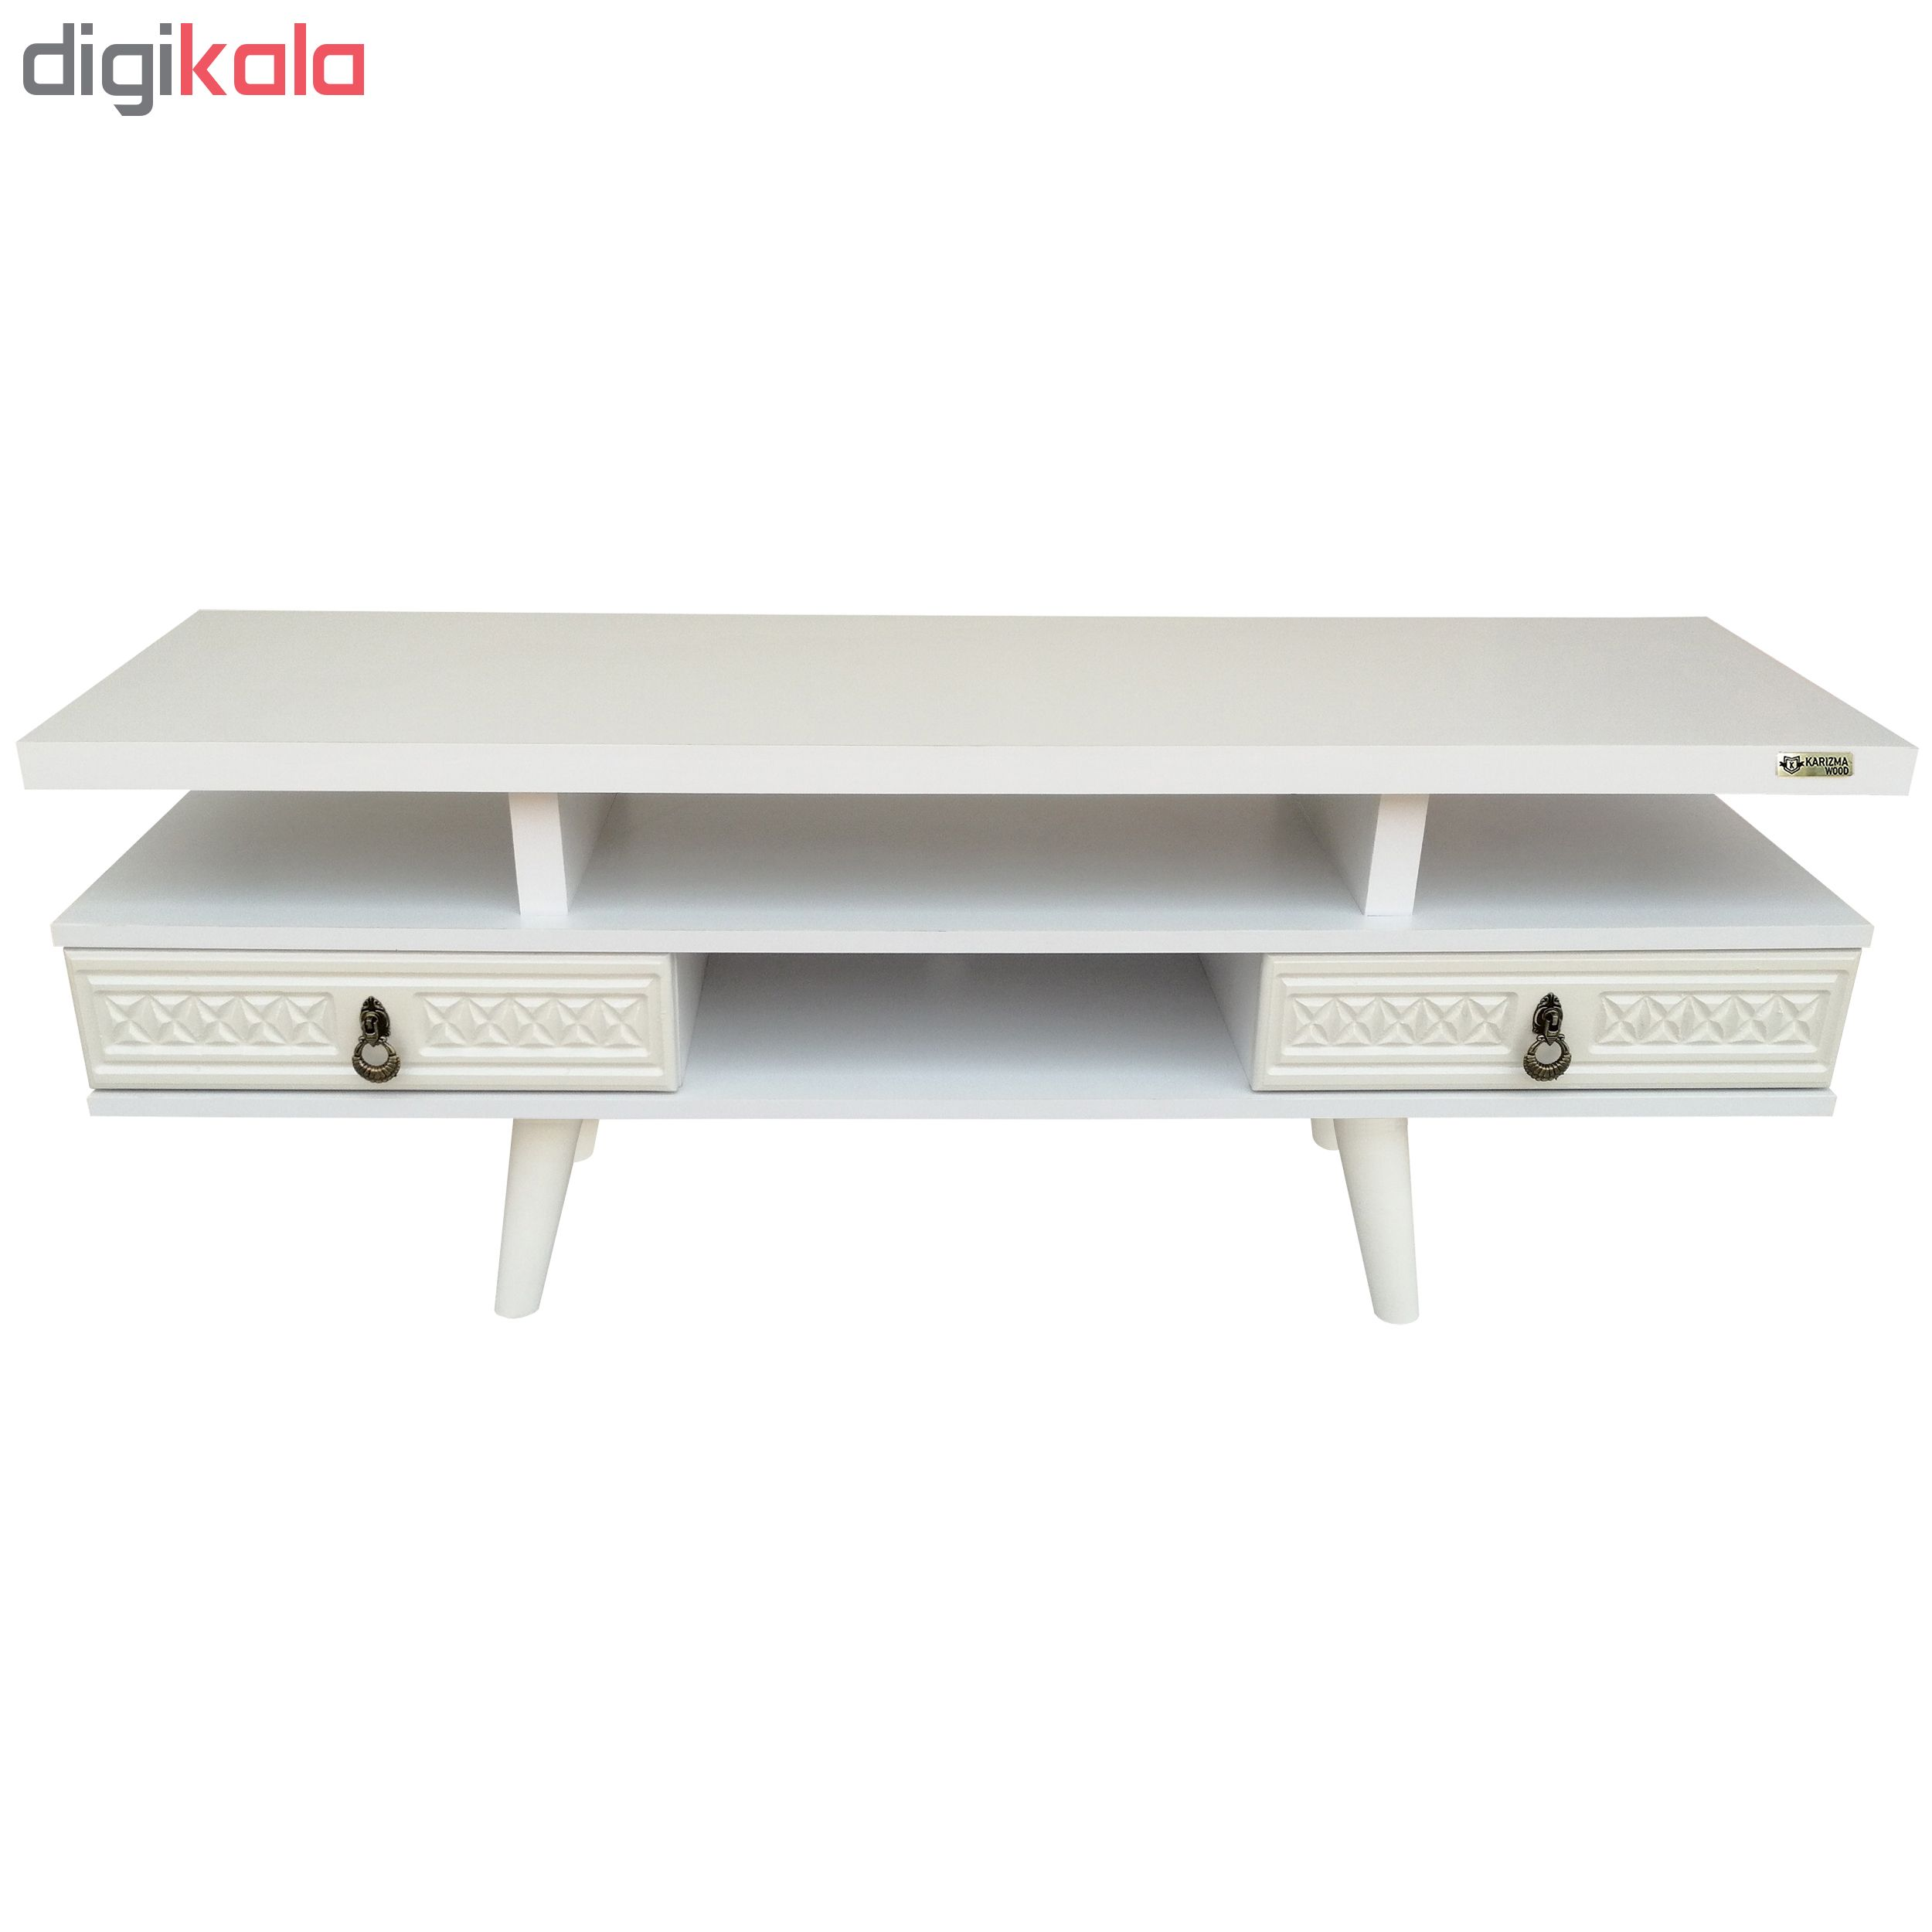 میز تلویزیون کاریزما وود مدل W.KSh208